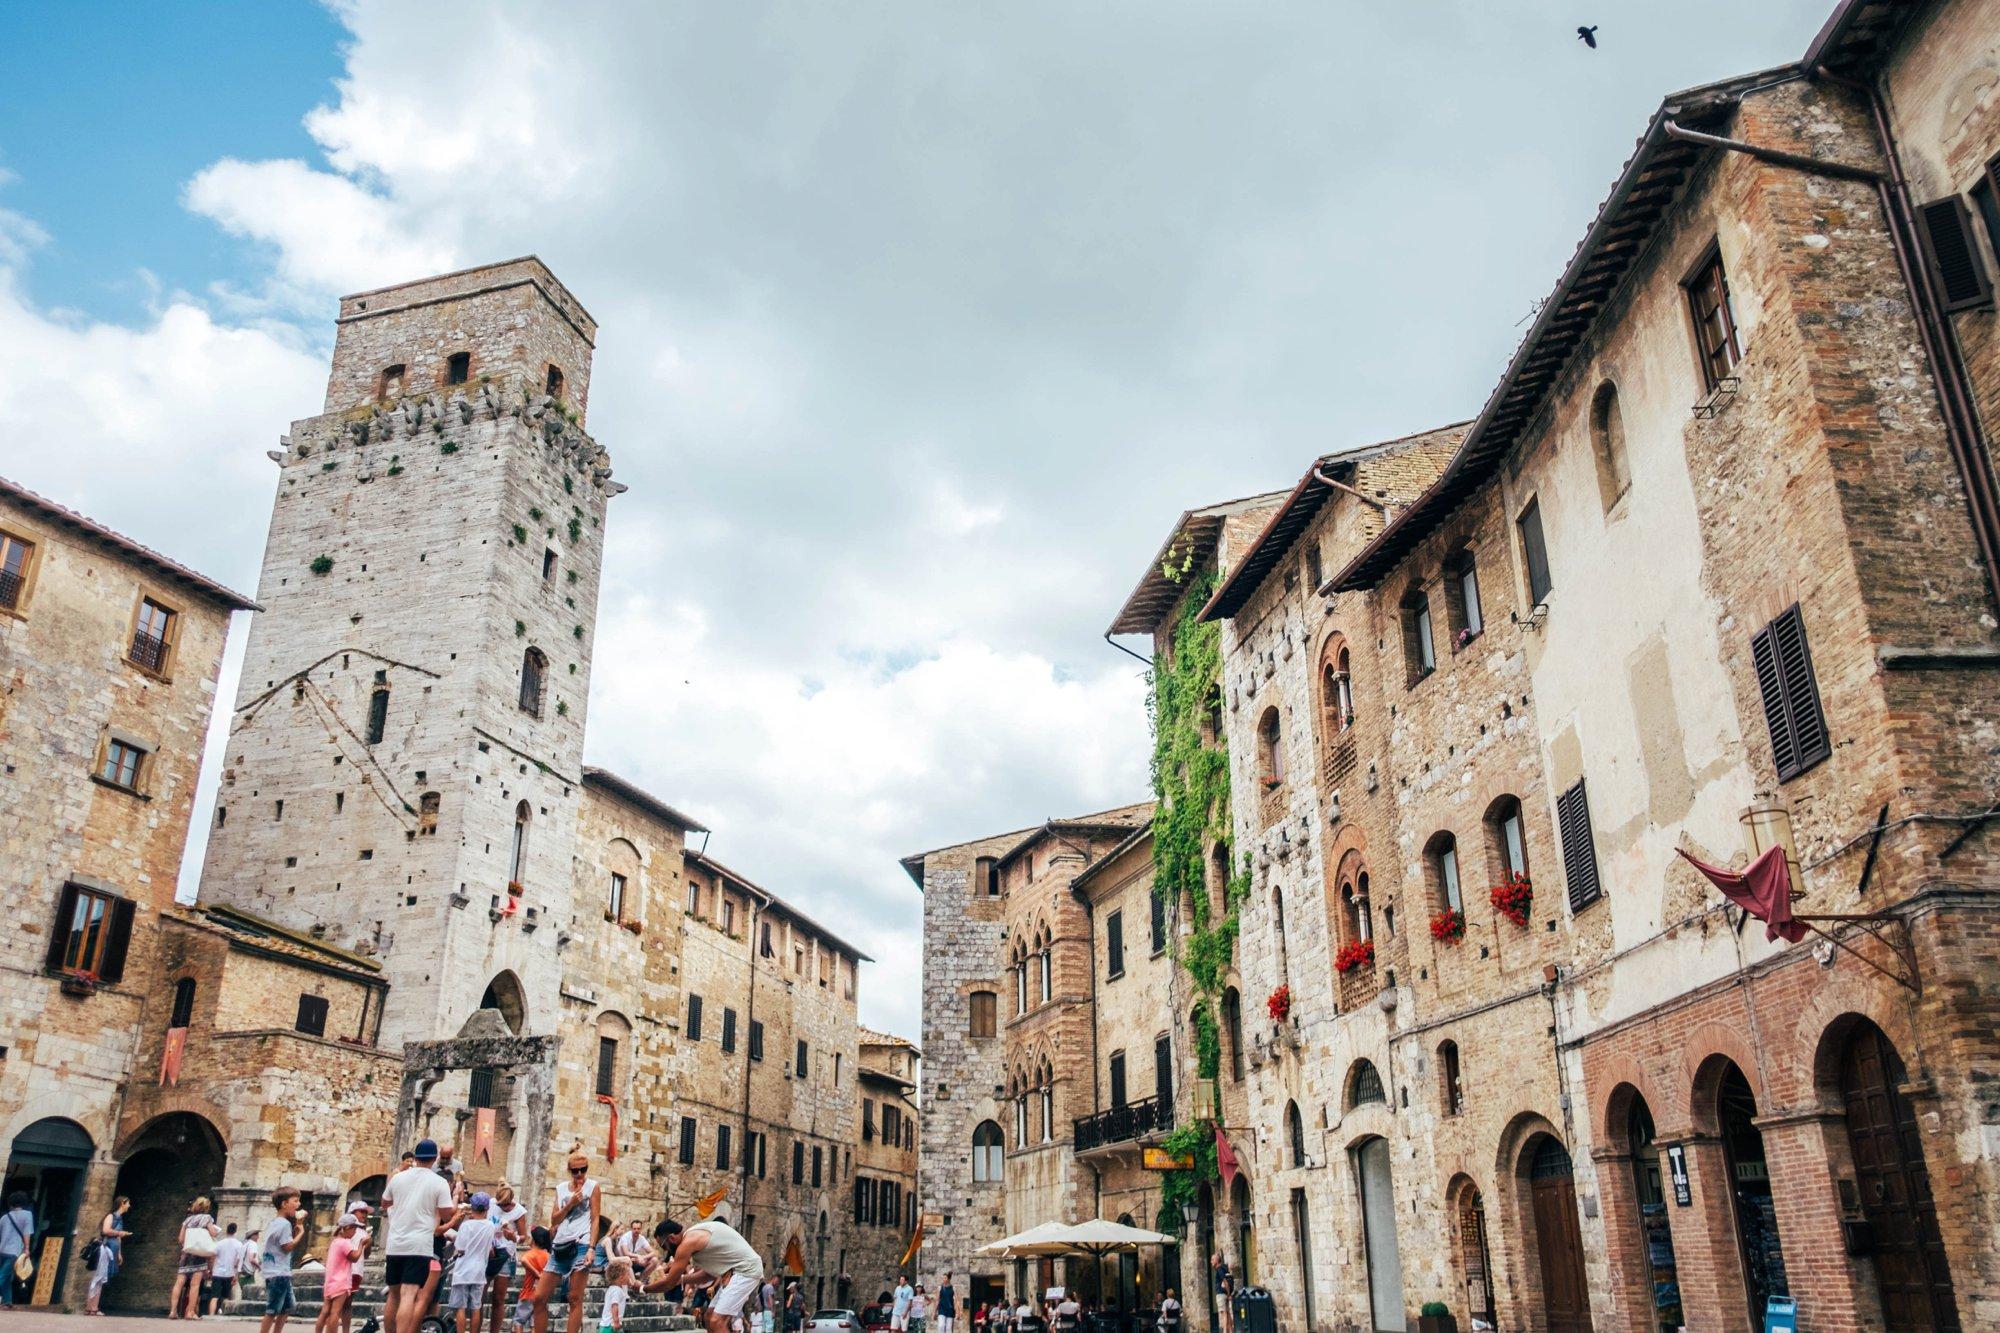 St Gimignano Tuscany Essex Documentary Travel Photographer